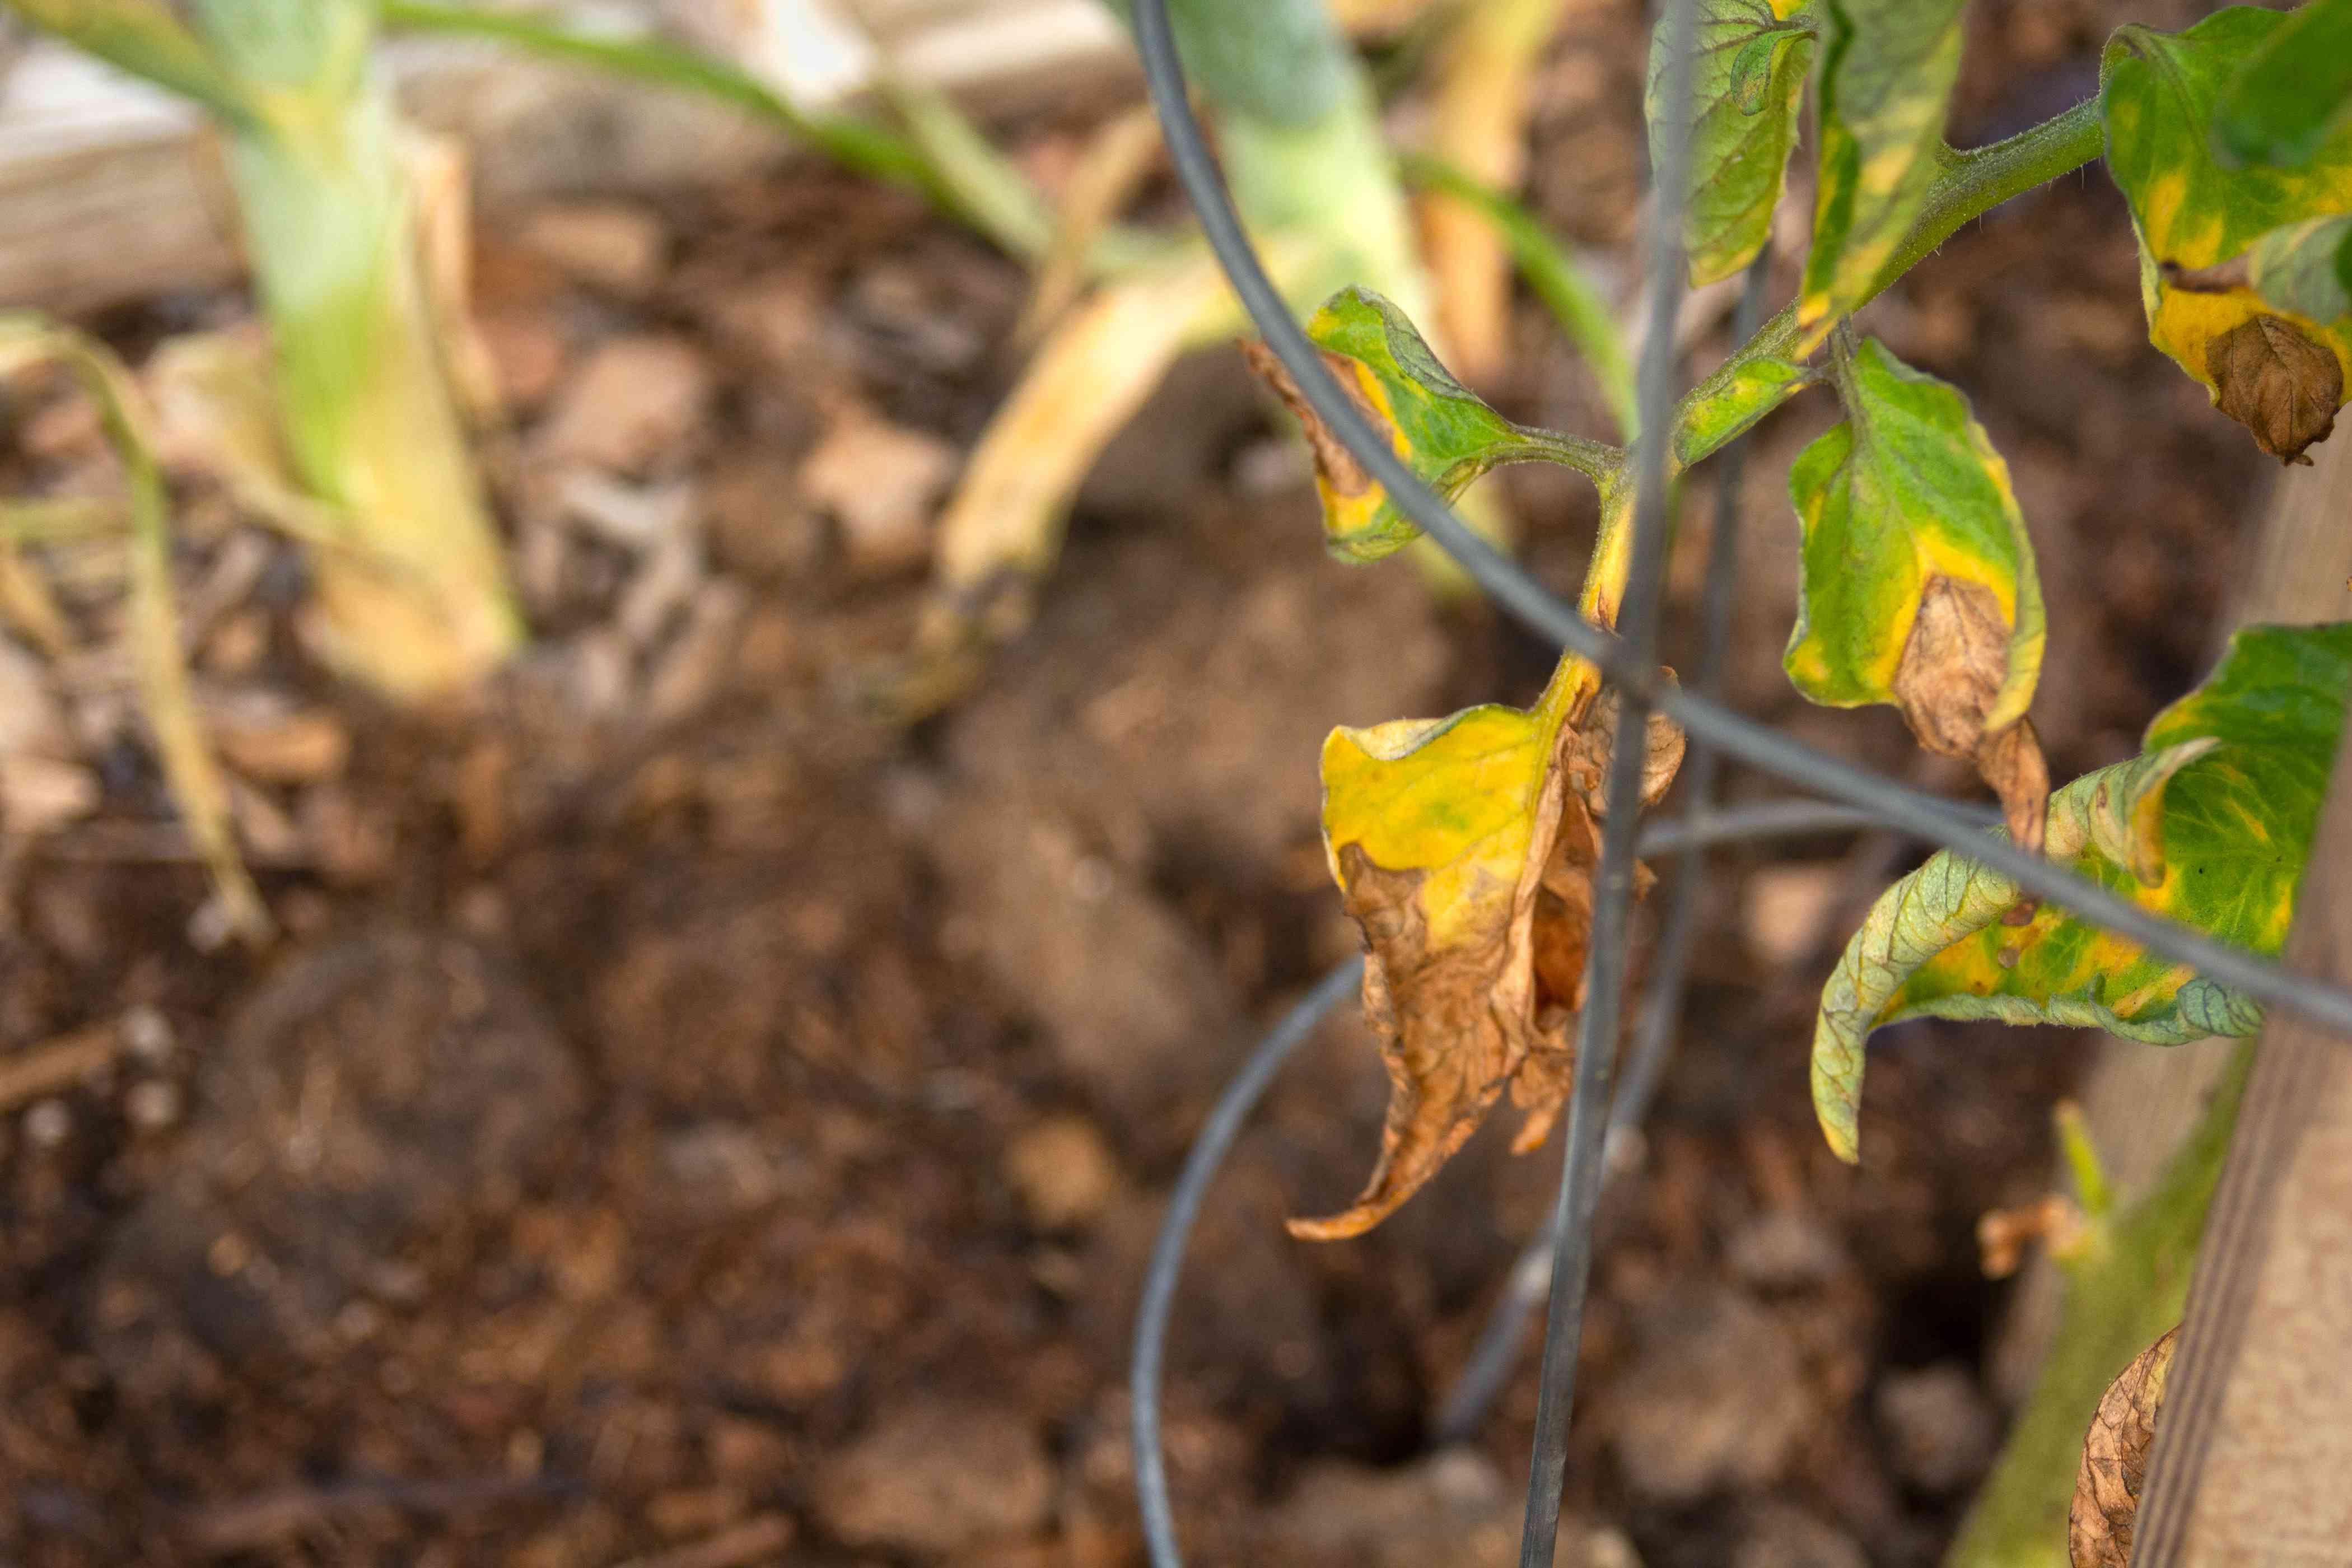 Tomatoe leaves with disease in metal tower